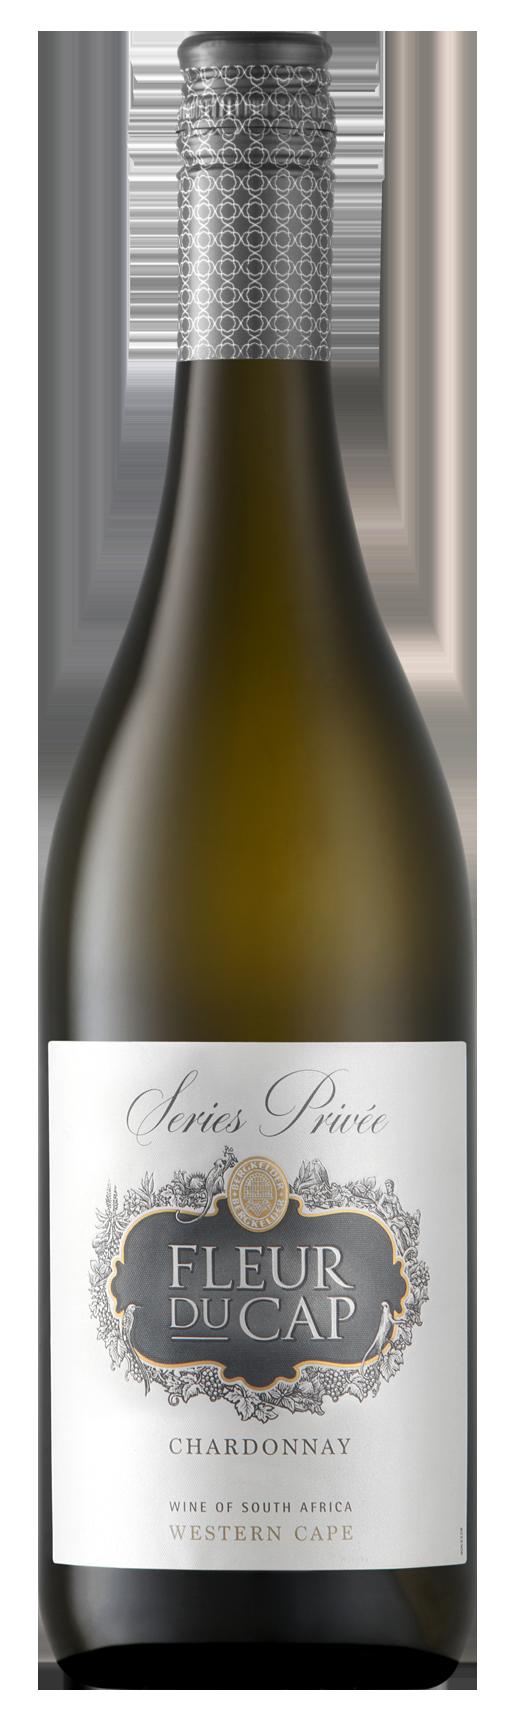 The Series Privée range Series Privée Chardonnay